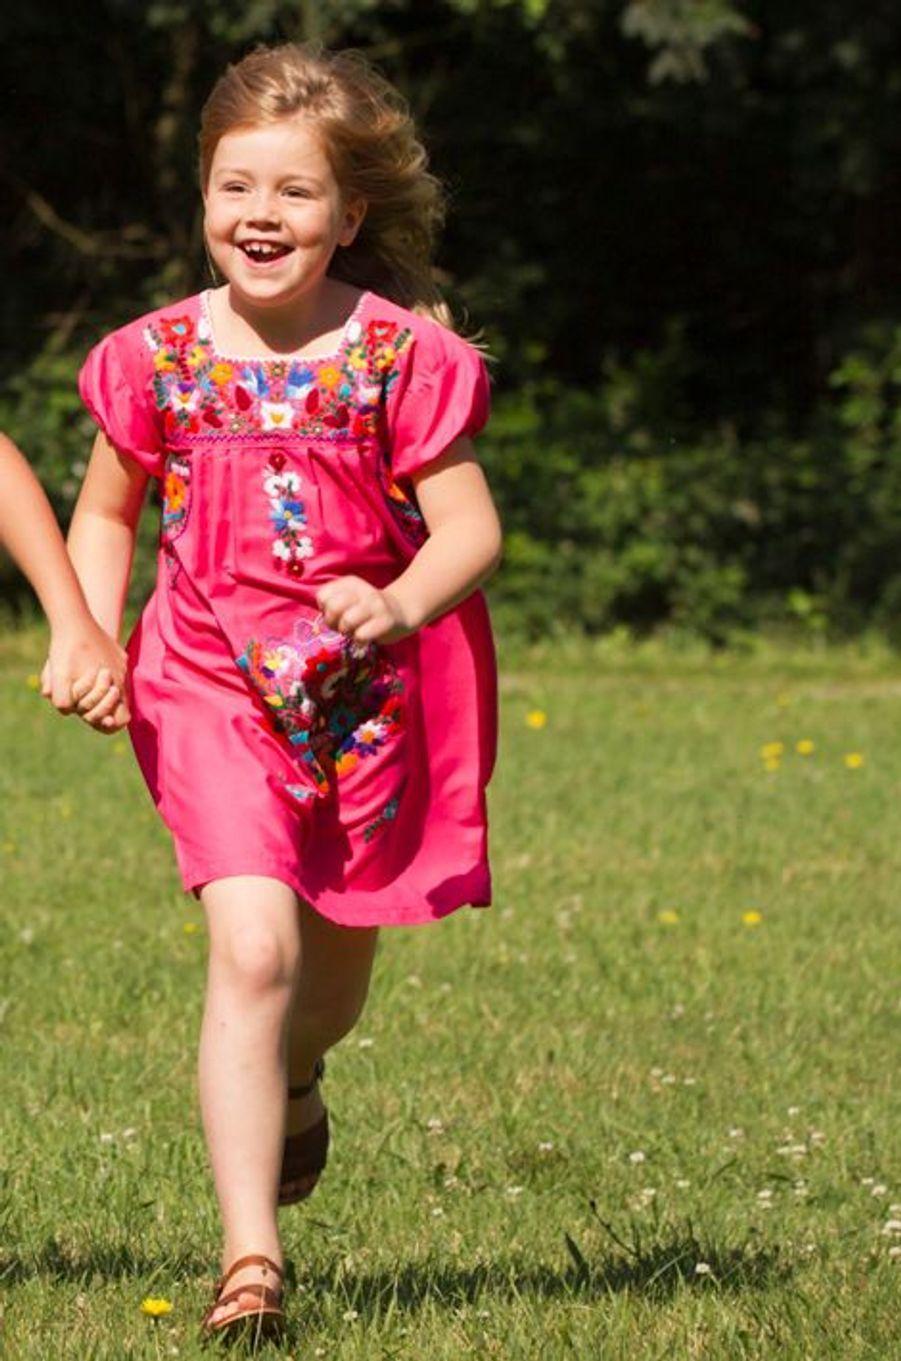 La princesse Alexia, le 7 juillet 2012